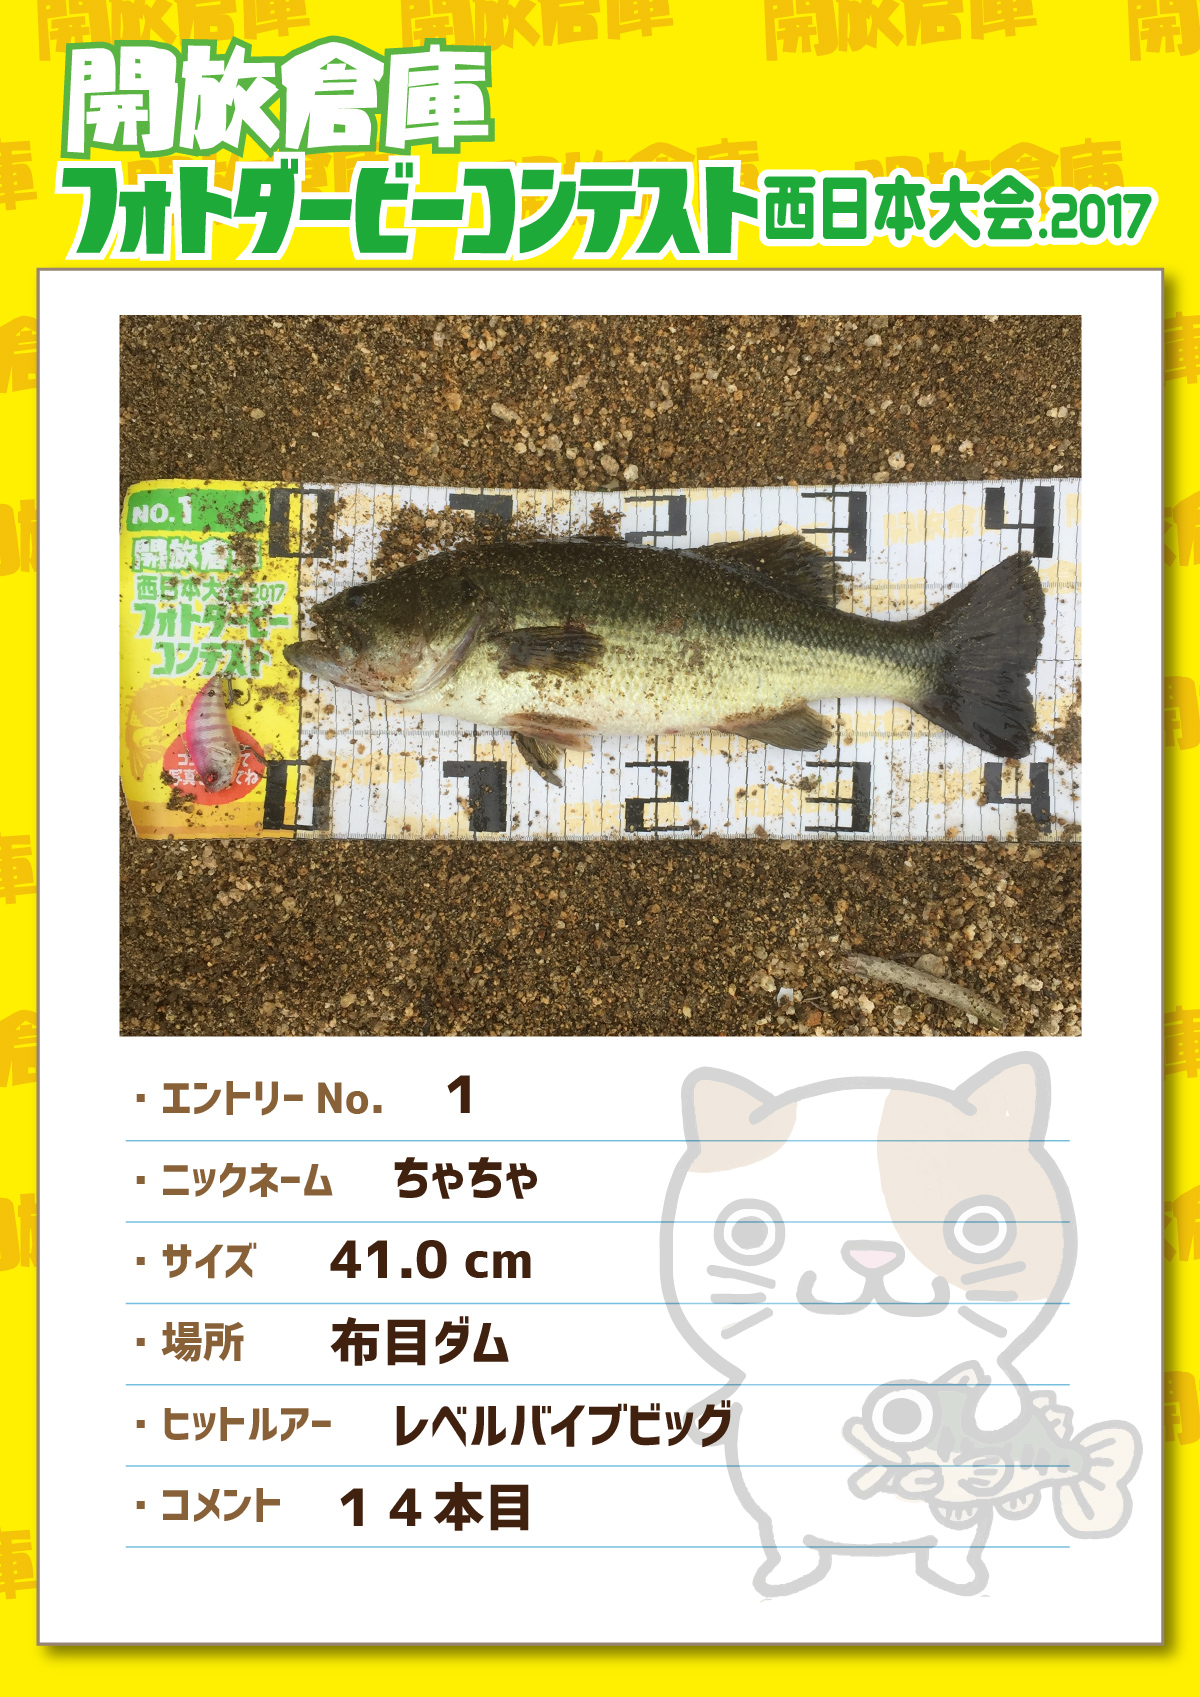 No.001 ちゃちゃ 41.0cm 布目ダム レベルバイブビッグ 14本目